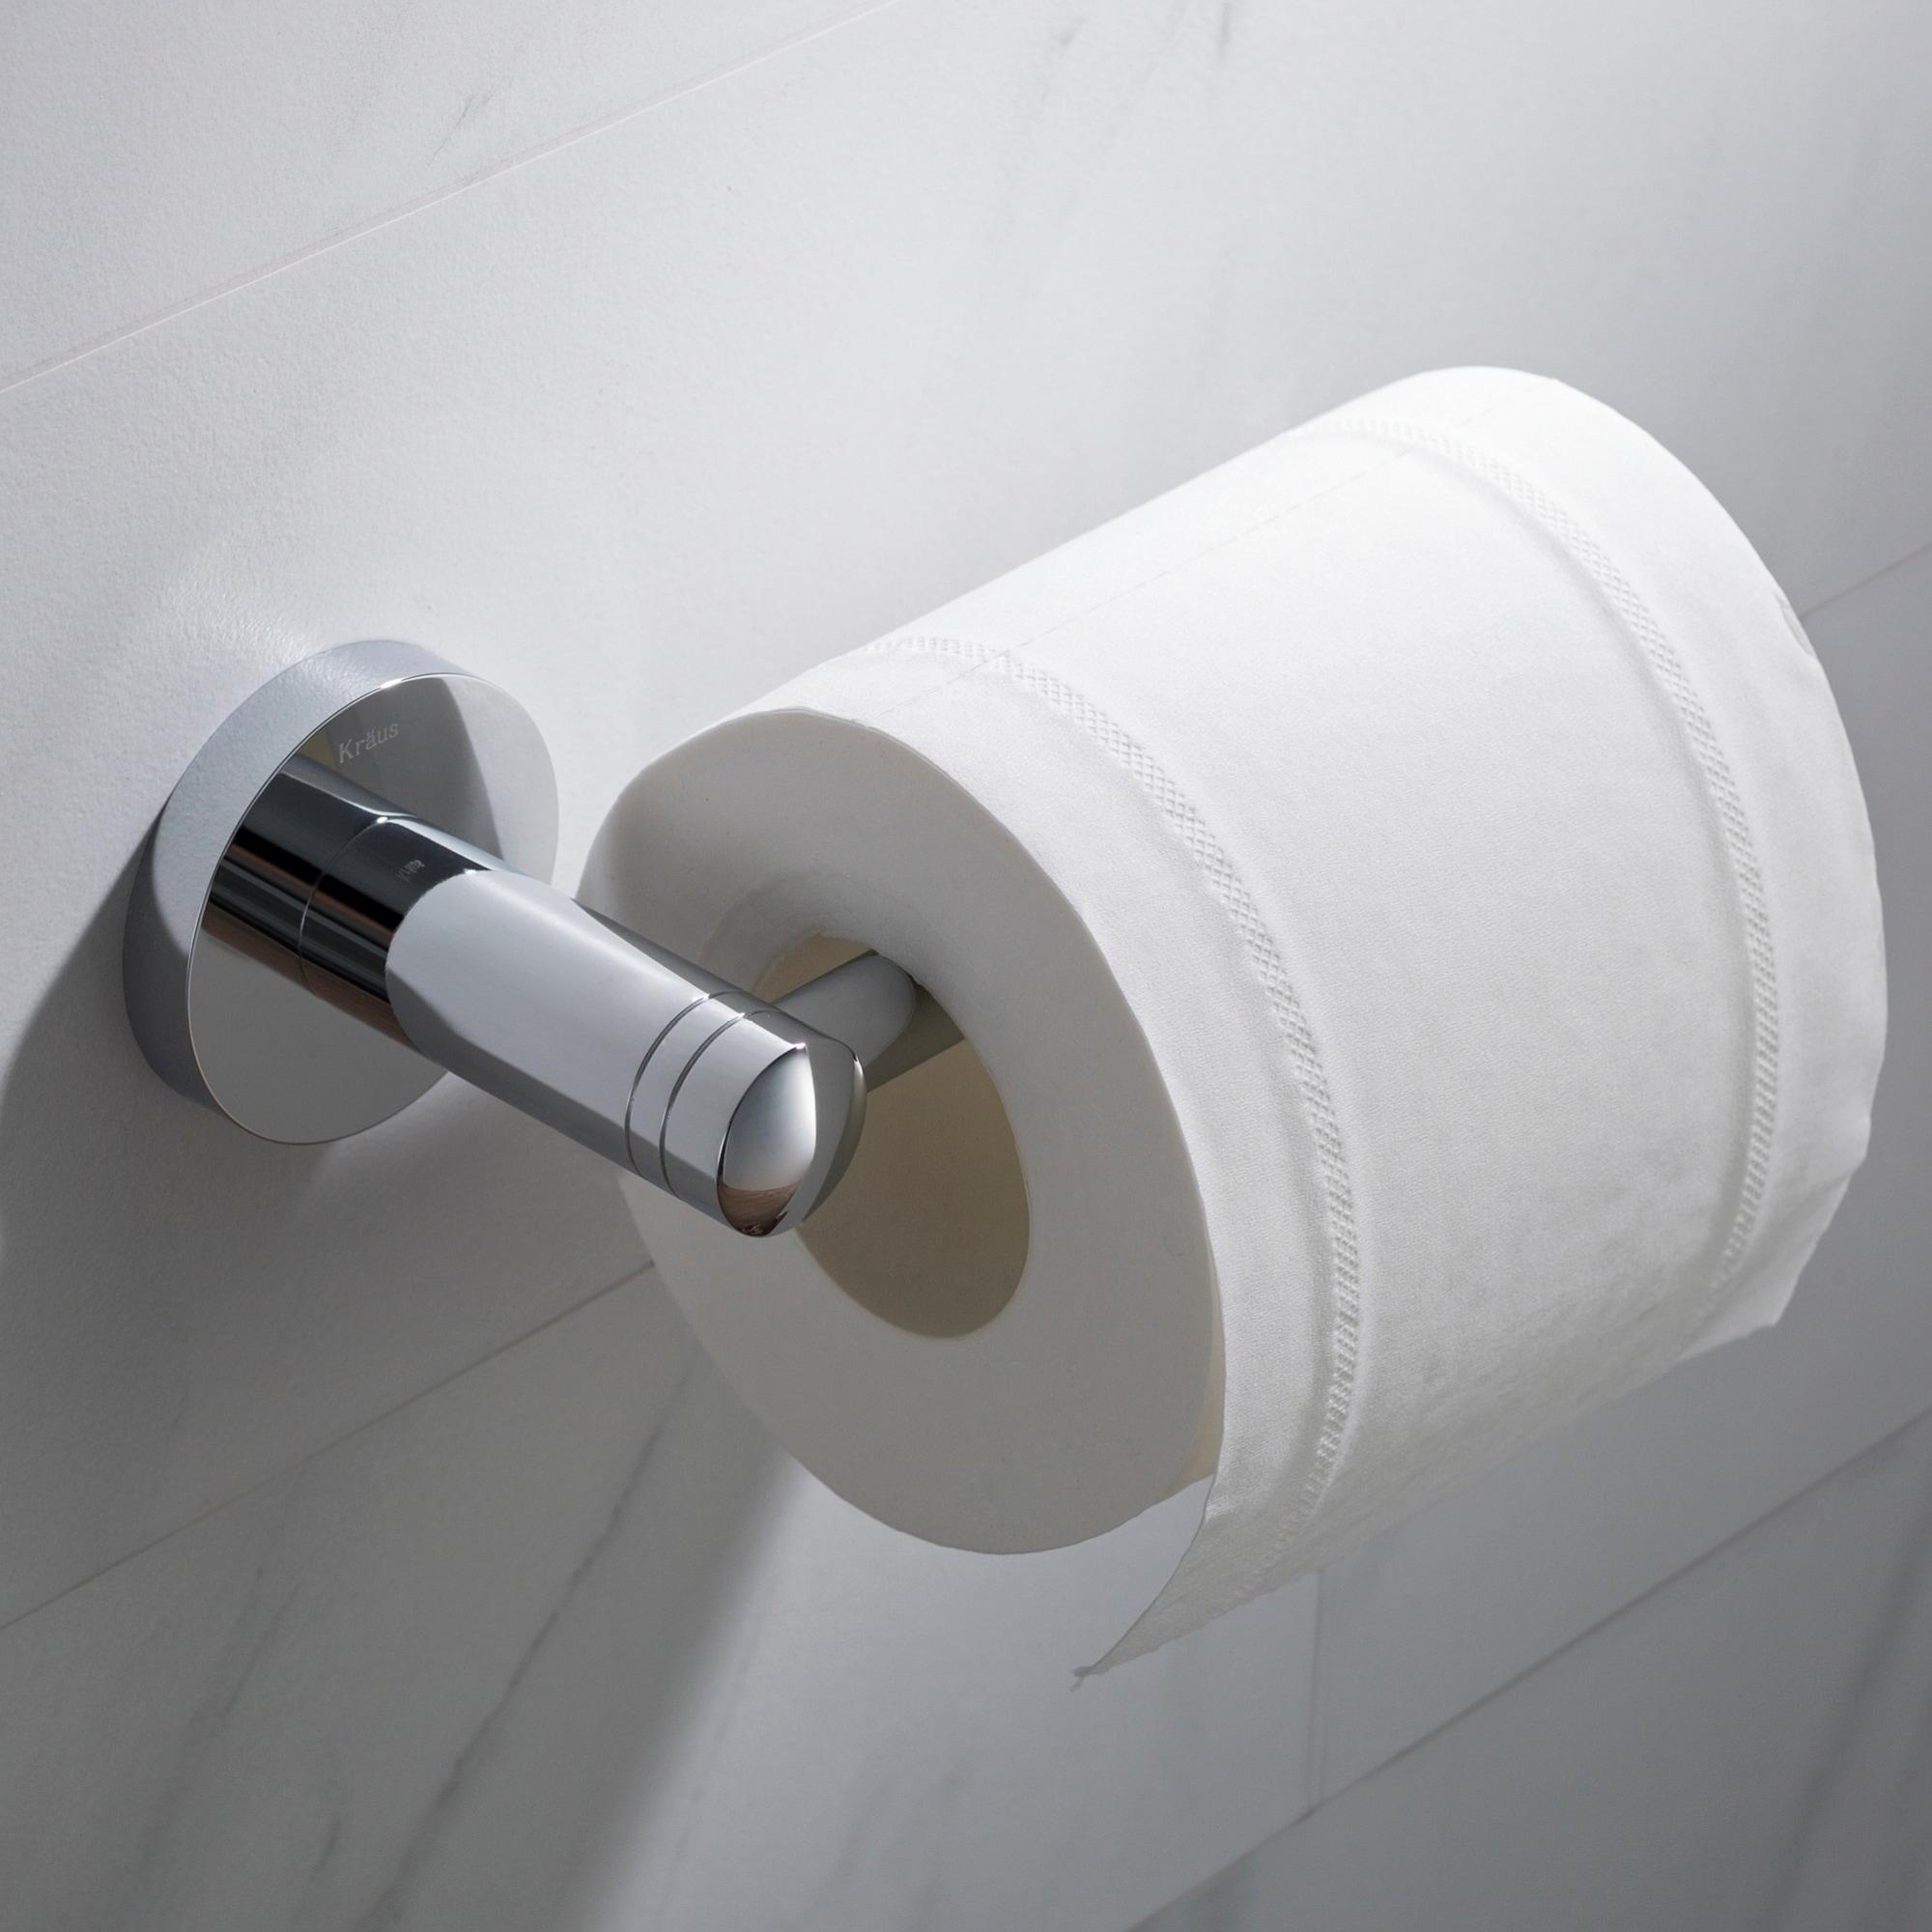 Kraus Elie Kea 18829 Bathroom Toilet Paper Holder In Chrome Brushed Nickel Matte Black Finish Free Shipping On Orders Over 45